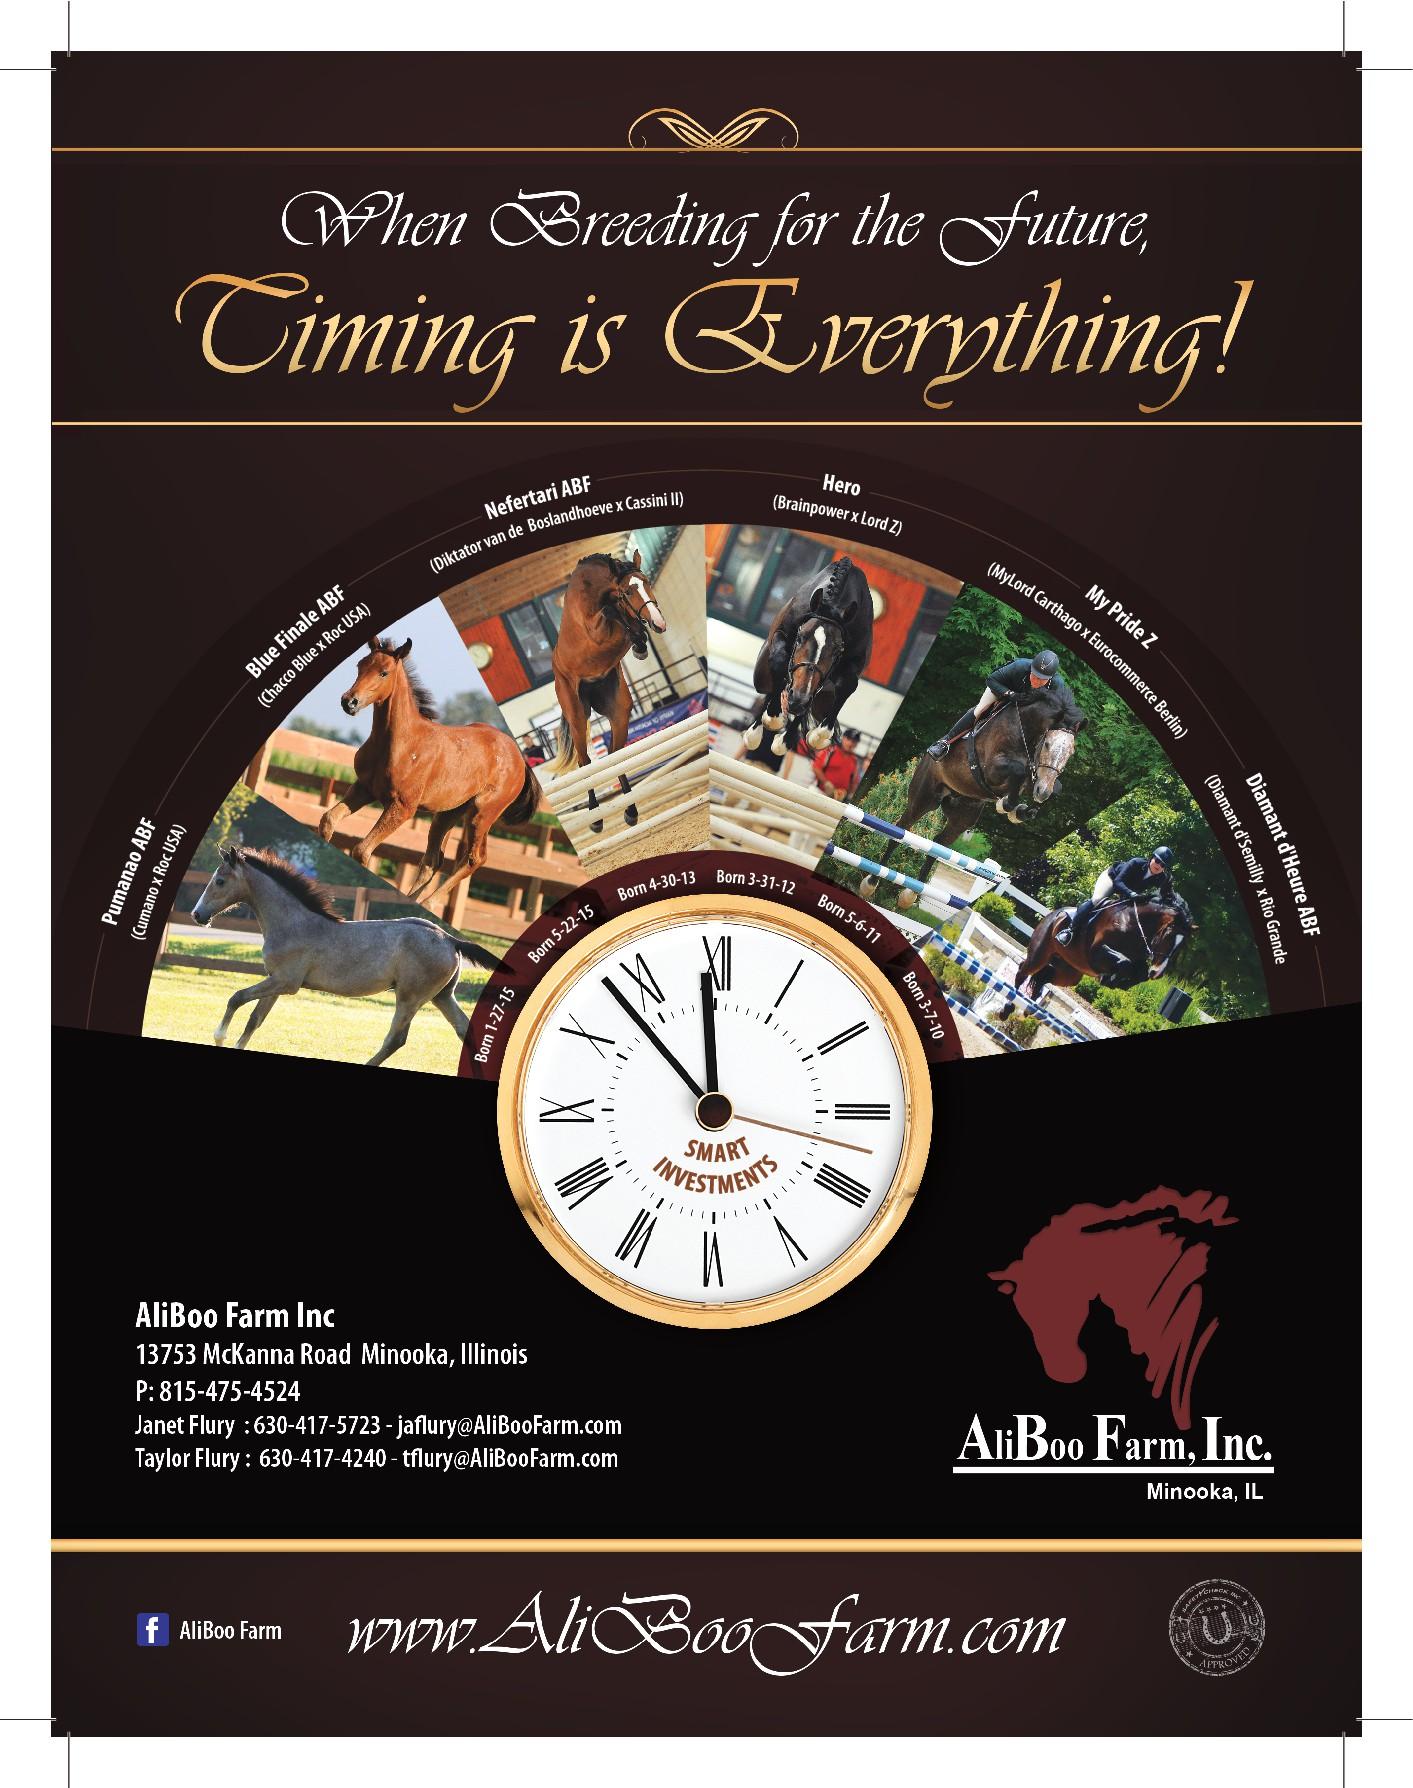 AliBoo Farm, Inc. - Equine Advertisement - Breeding Tomorrow's Champions Today